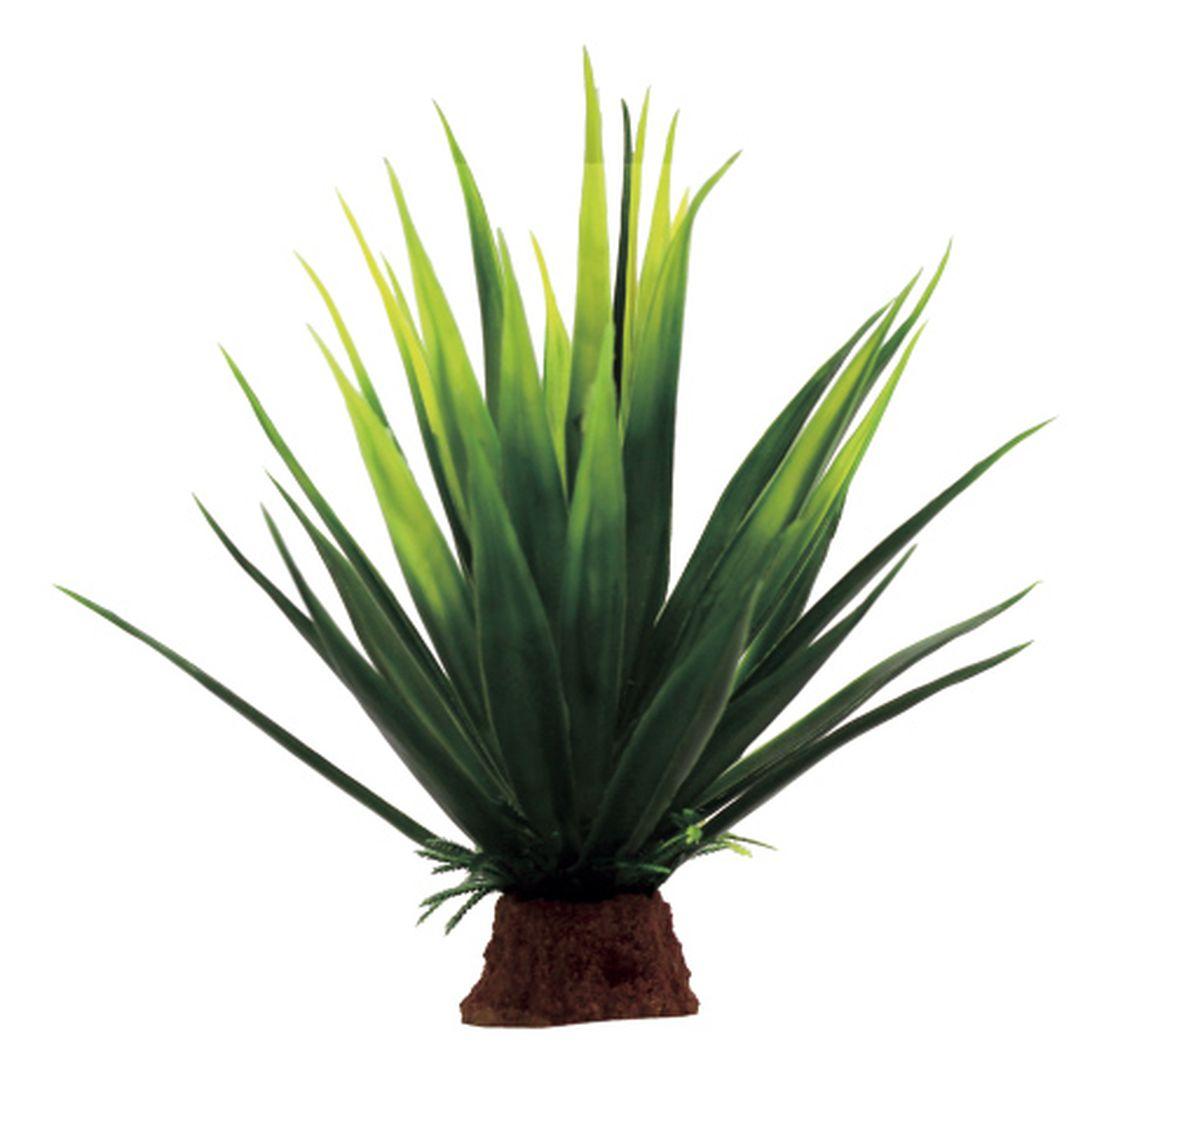 Растение для аквариума ArtUniq Агава, 13 x 13 x 16 смART-1130707Растение для аквариума ArtUniq Агава, 13 x 13 x 16 см